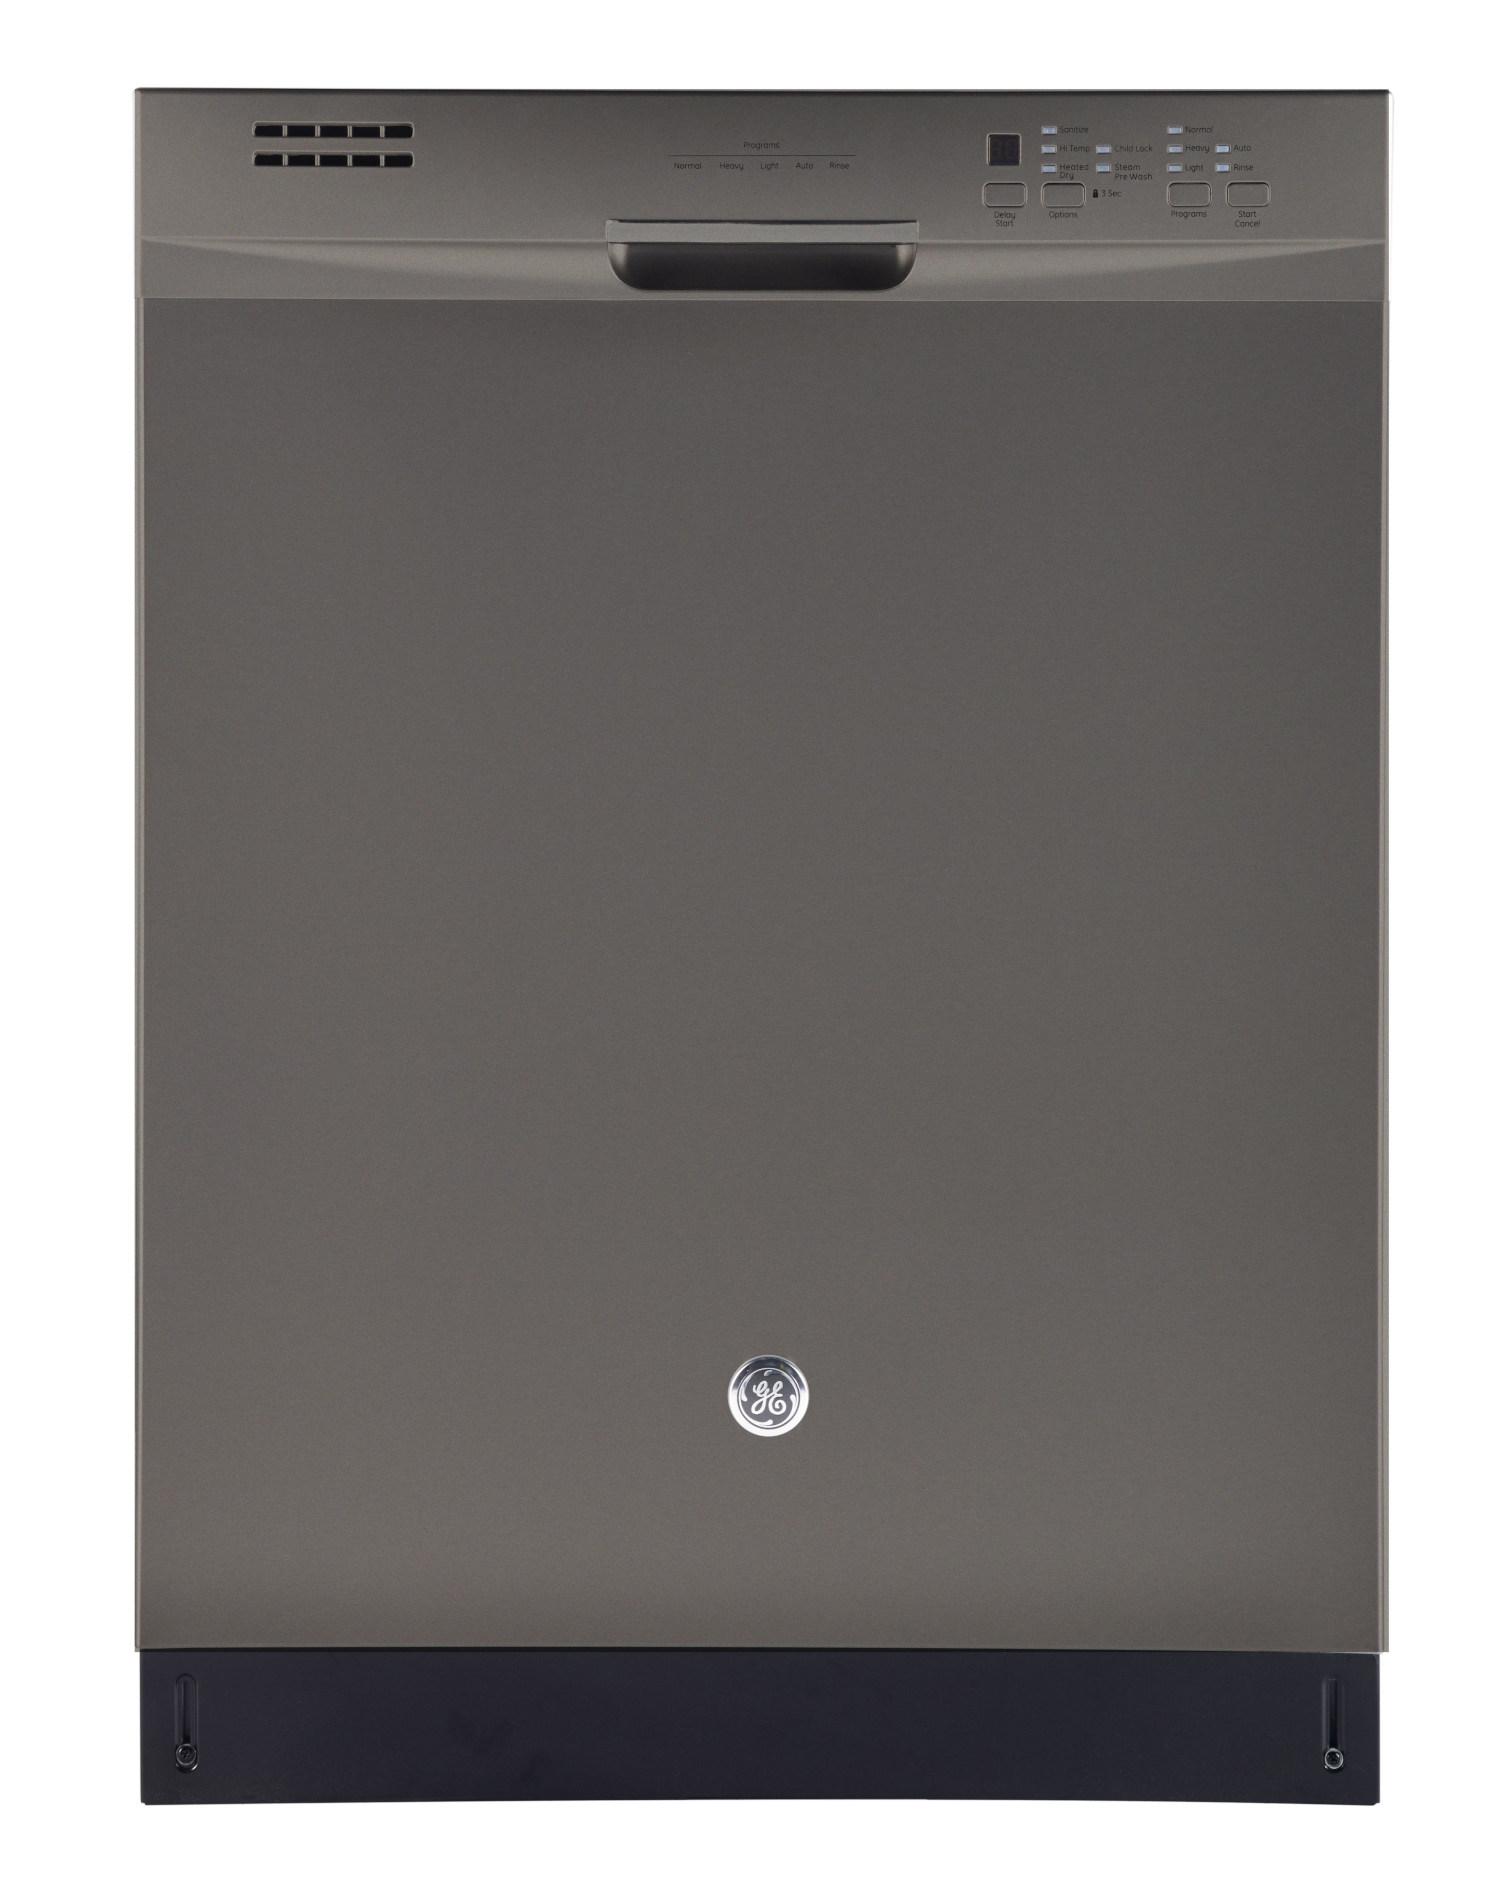 21933 – Dishwasher – GBF630SMLES